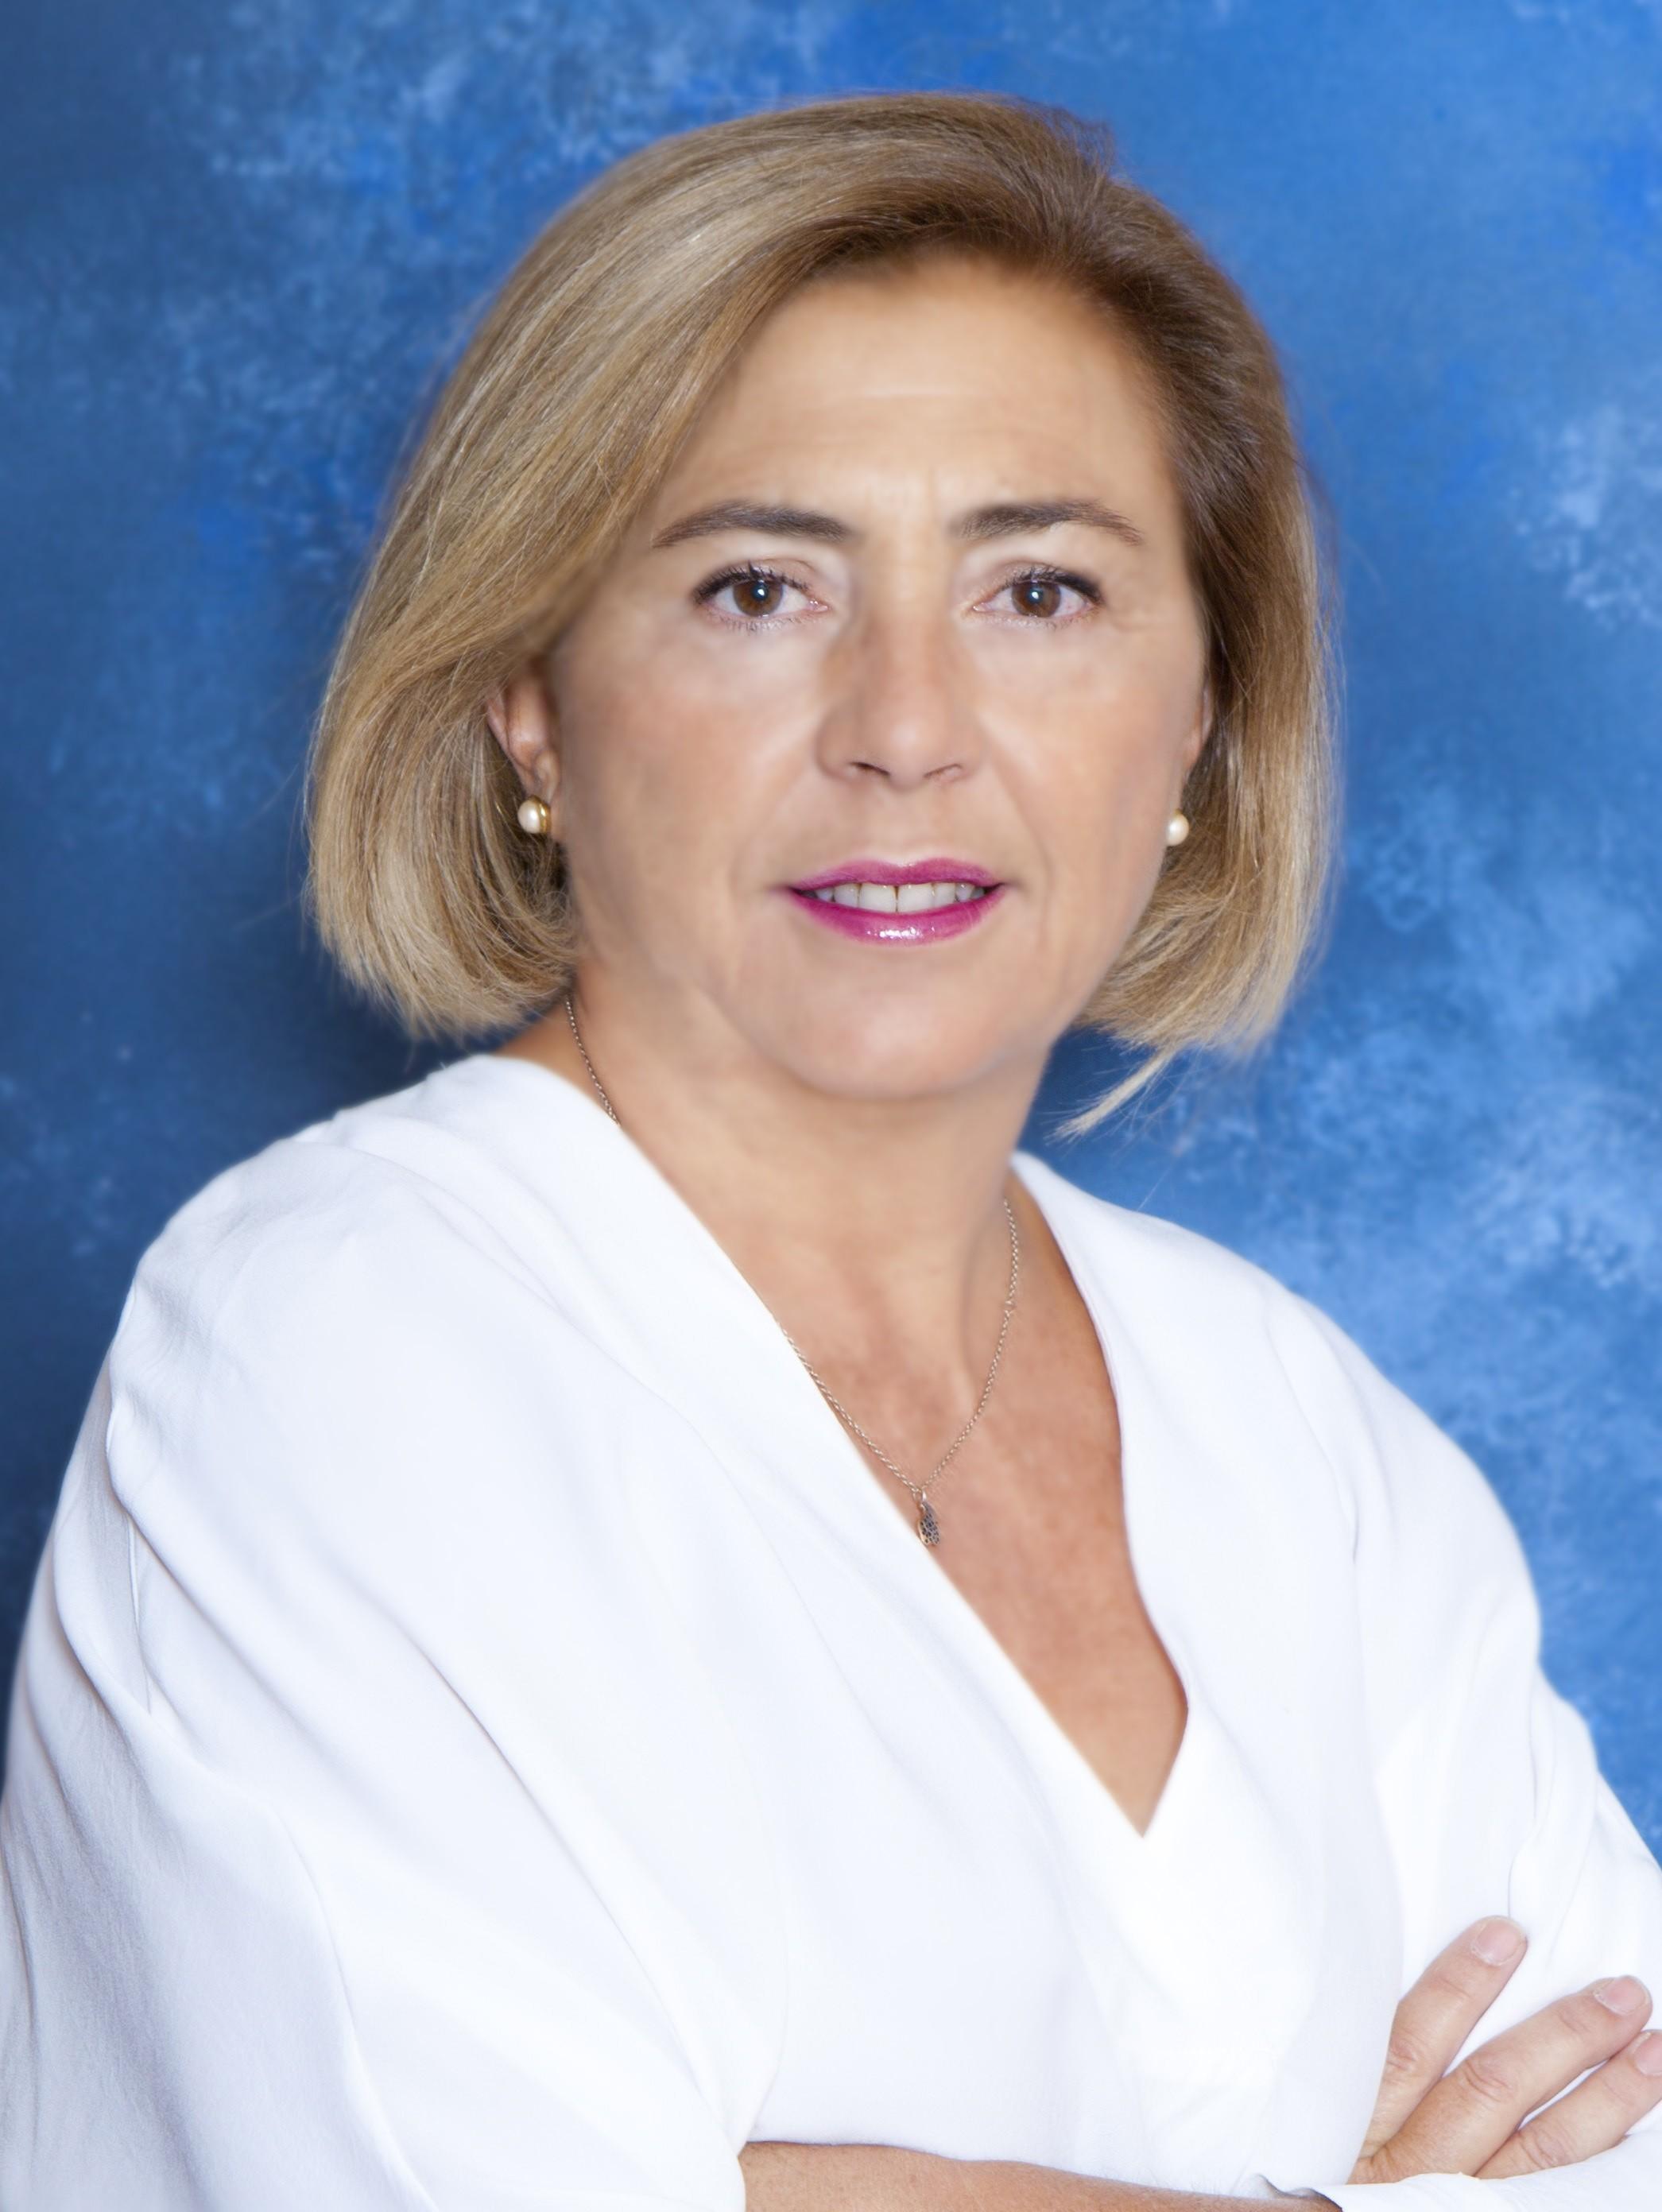 María Saldaña Fernández